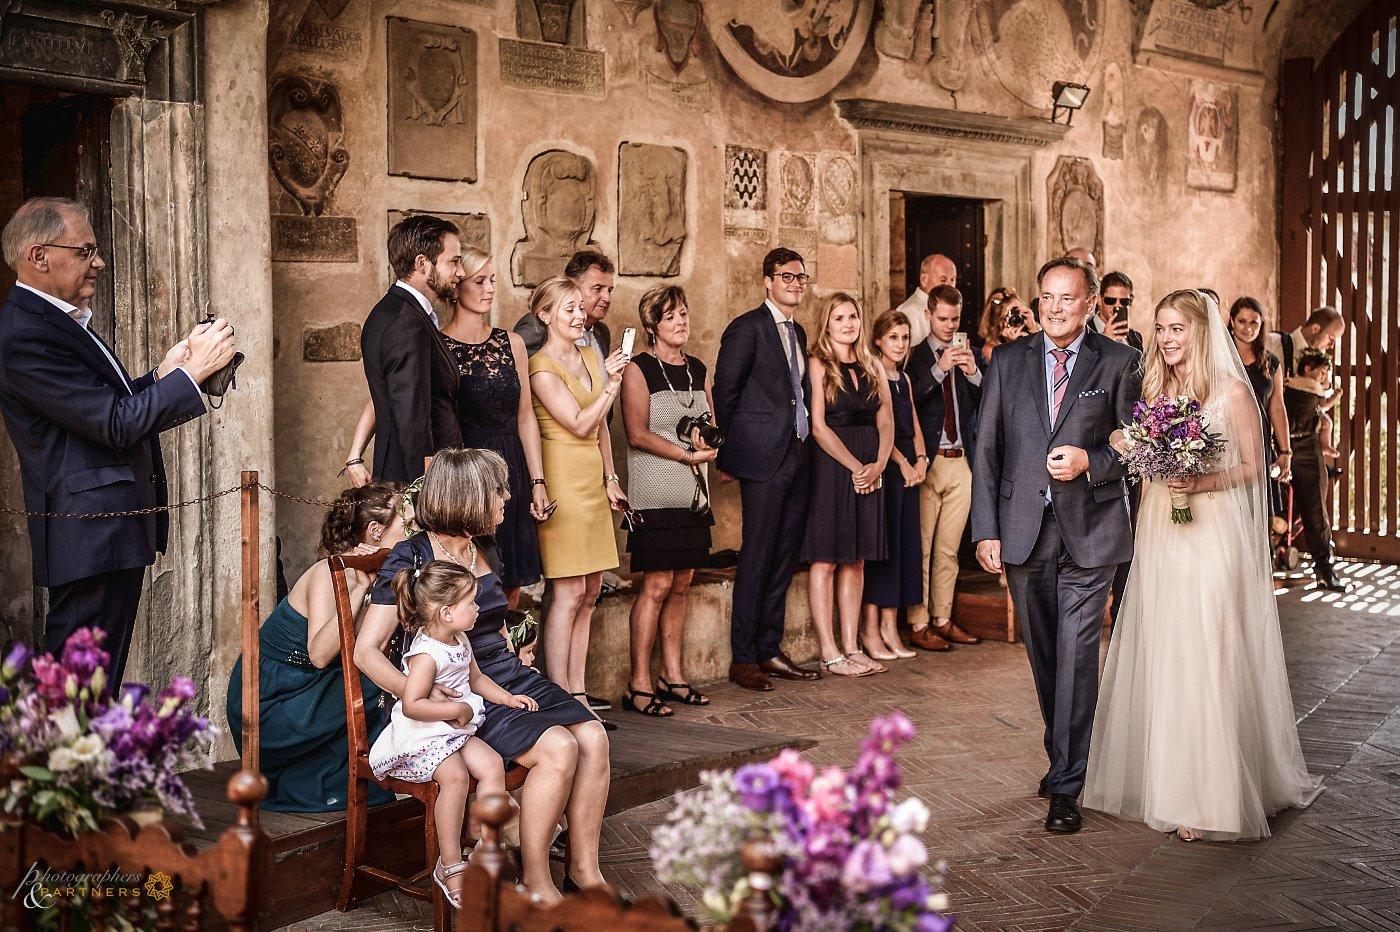 photographers_weddings_certaldo_04.jpg